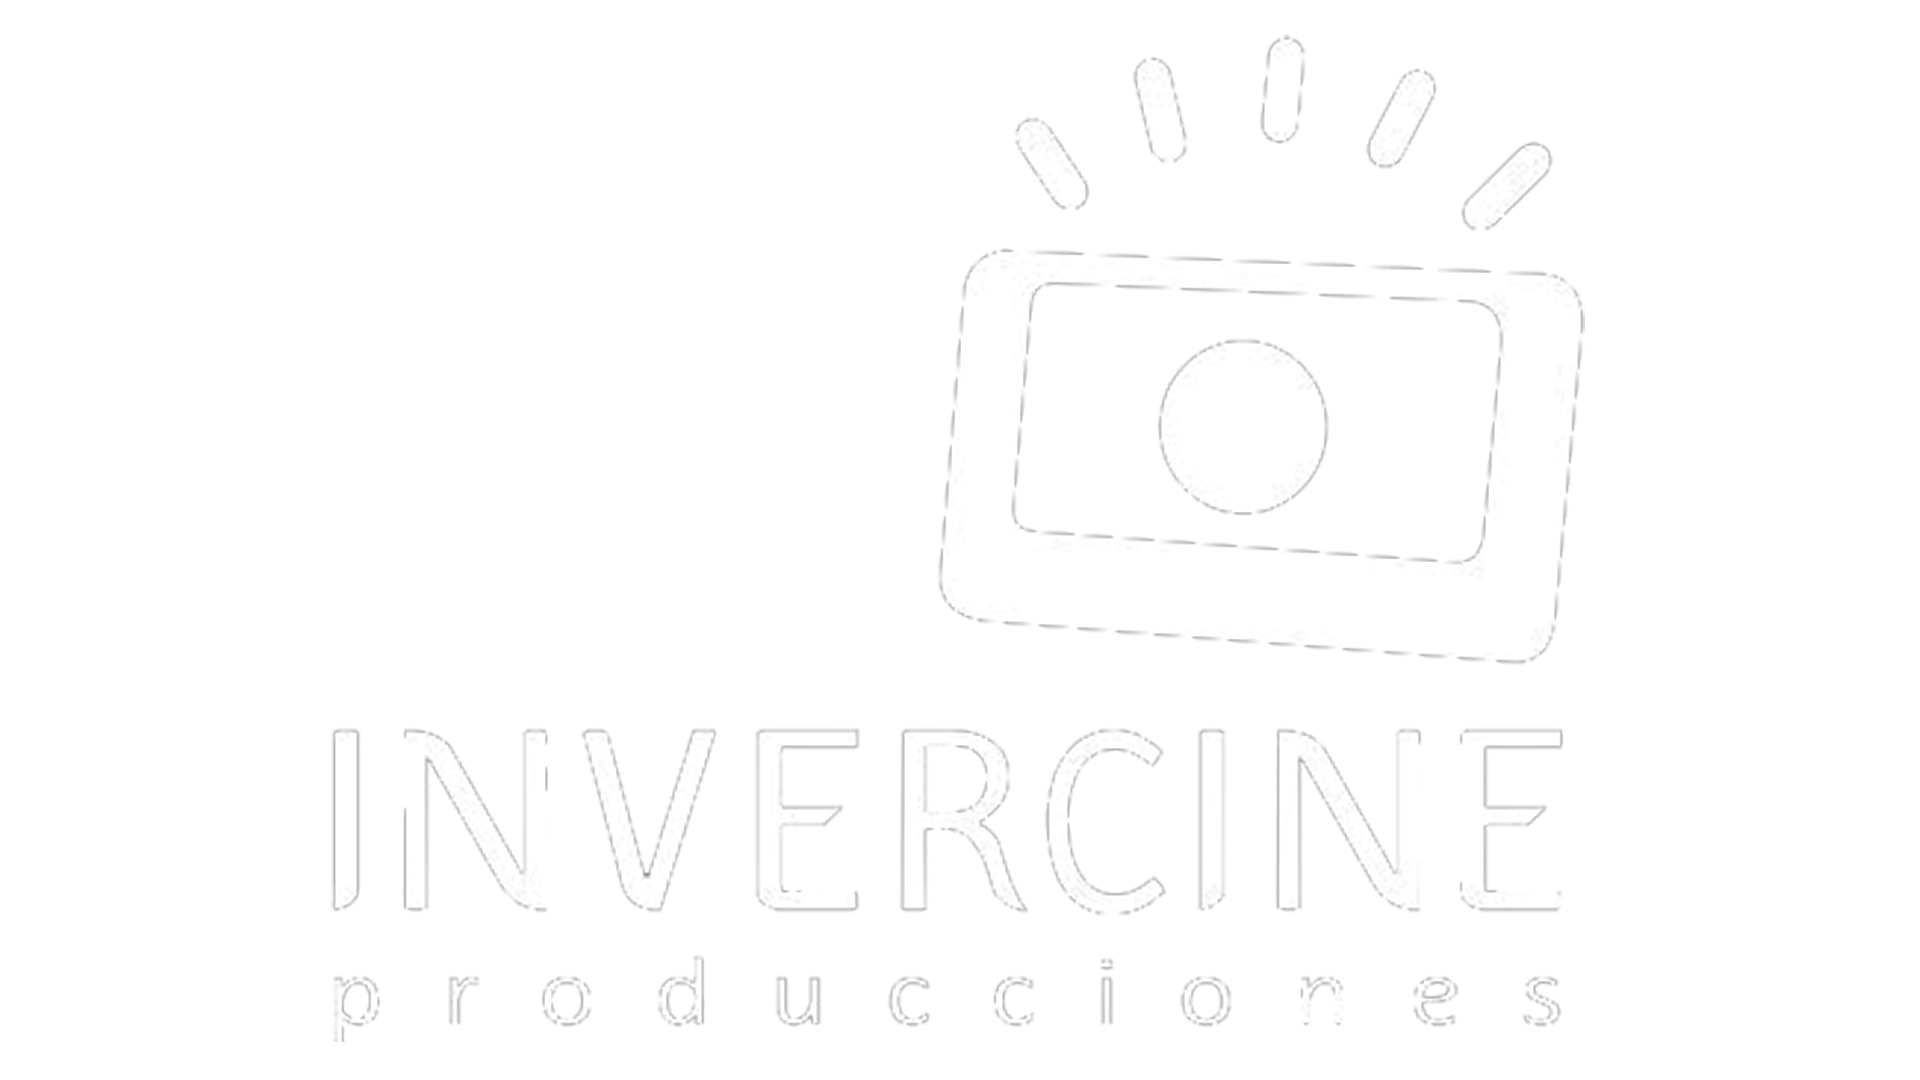 invercine